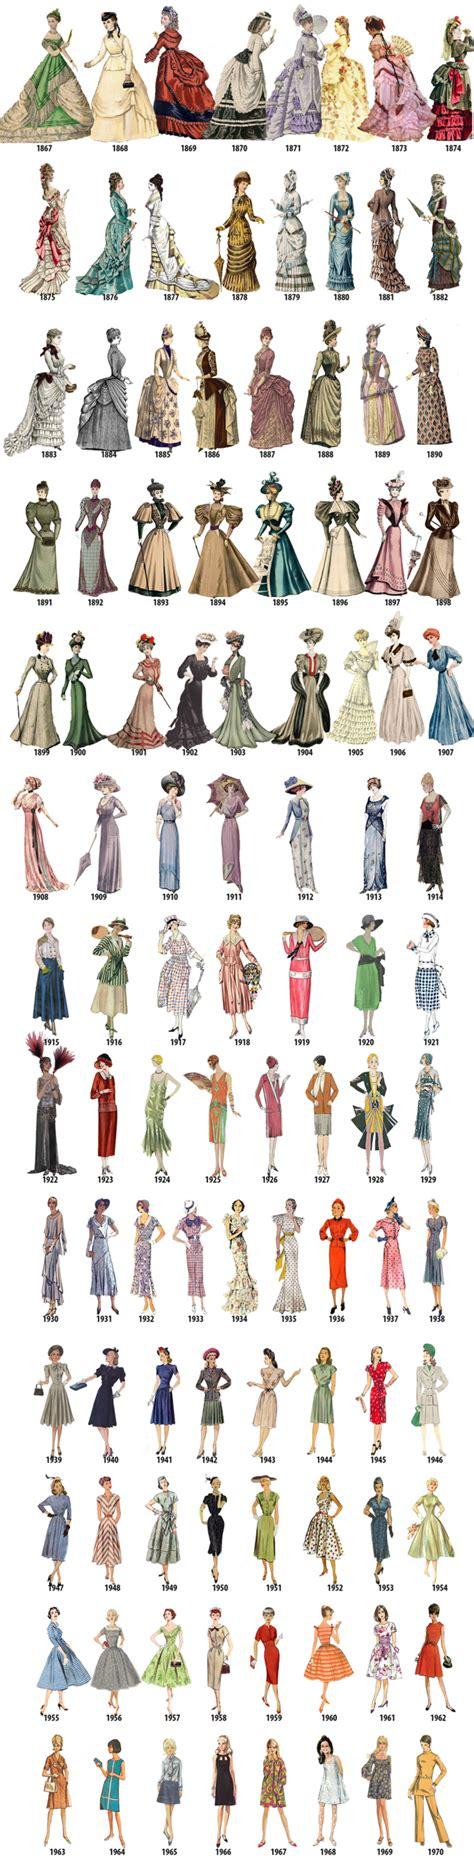 Pin en historia de la moda